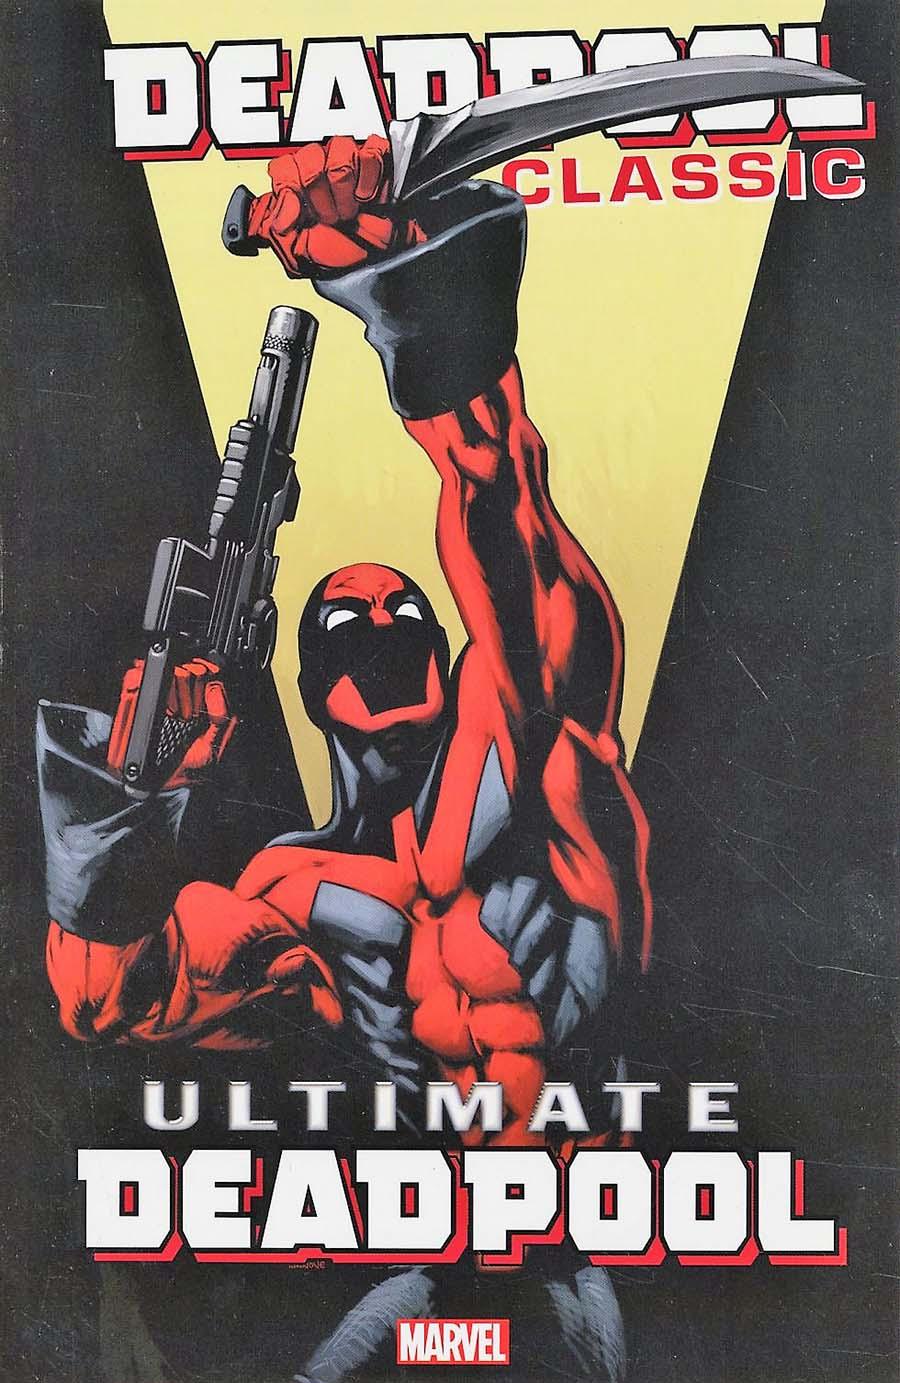 Deadpool Classic Vol 20 Ultimate Deadpool TP